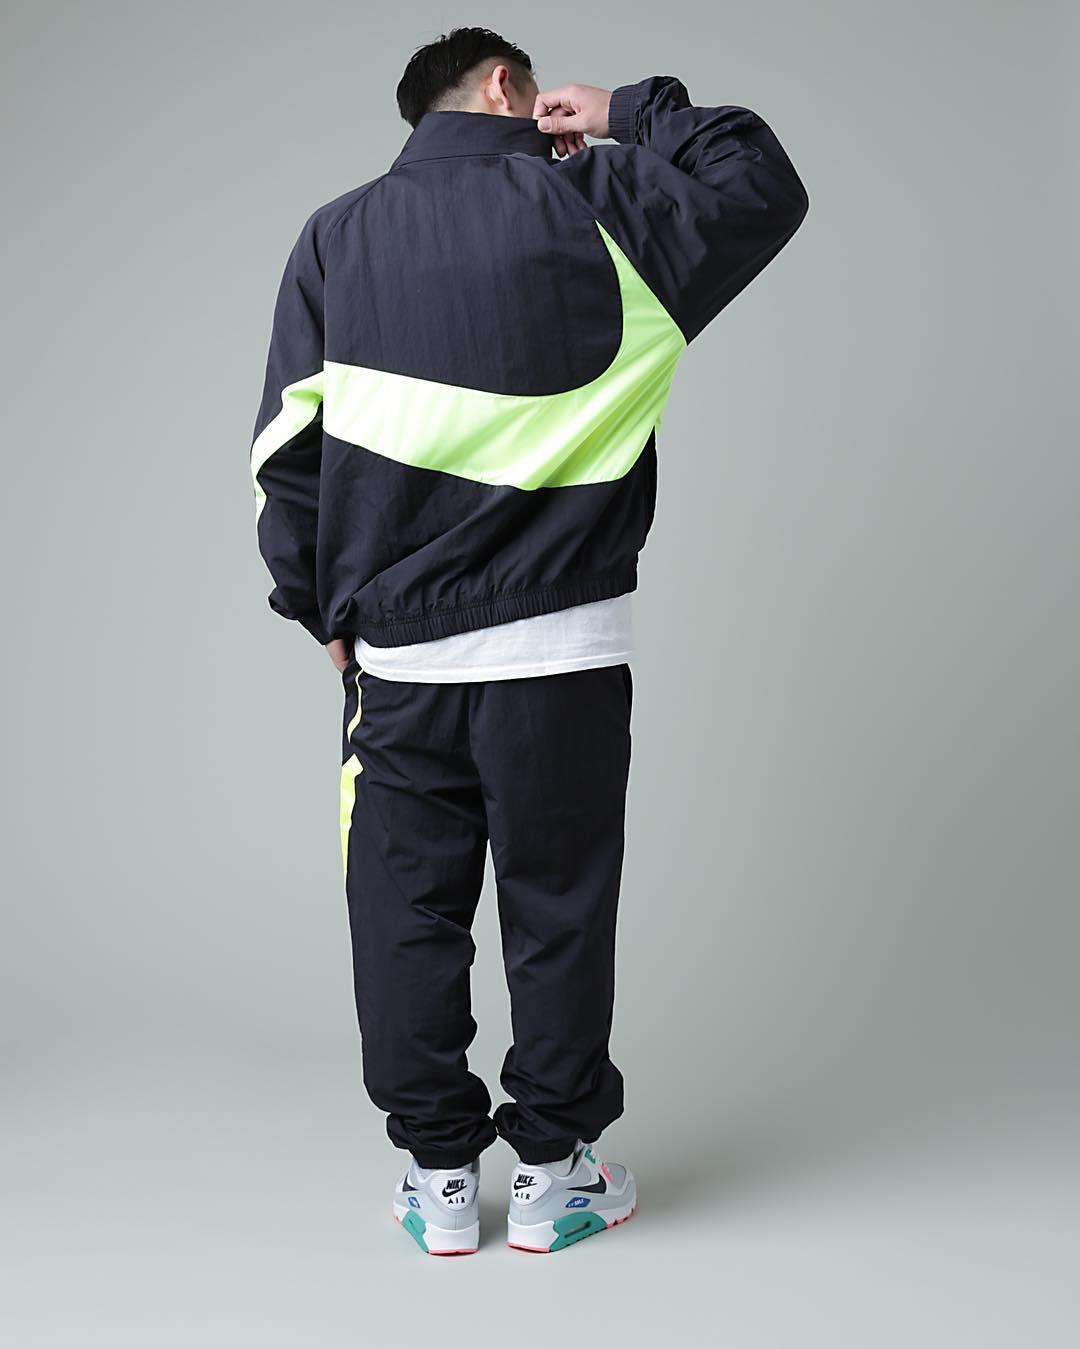 nike-anorak-jacket-pants-cojp-release-20180414